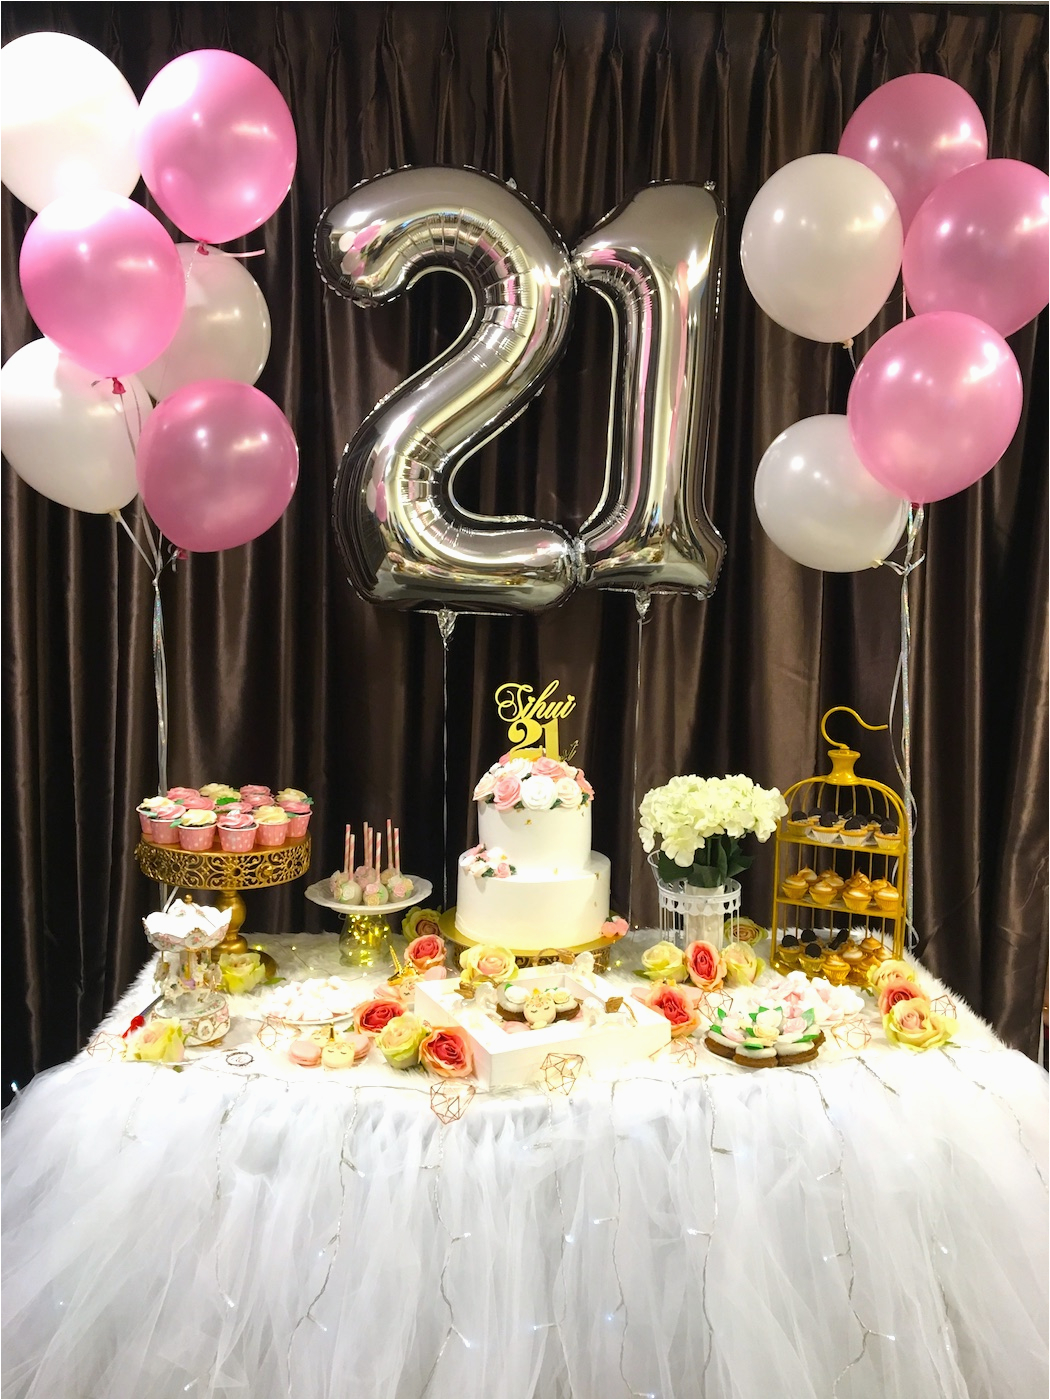 21st birthday decoration